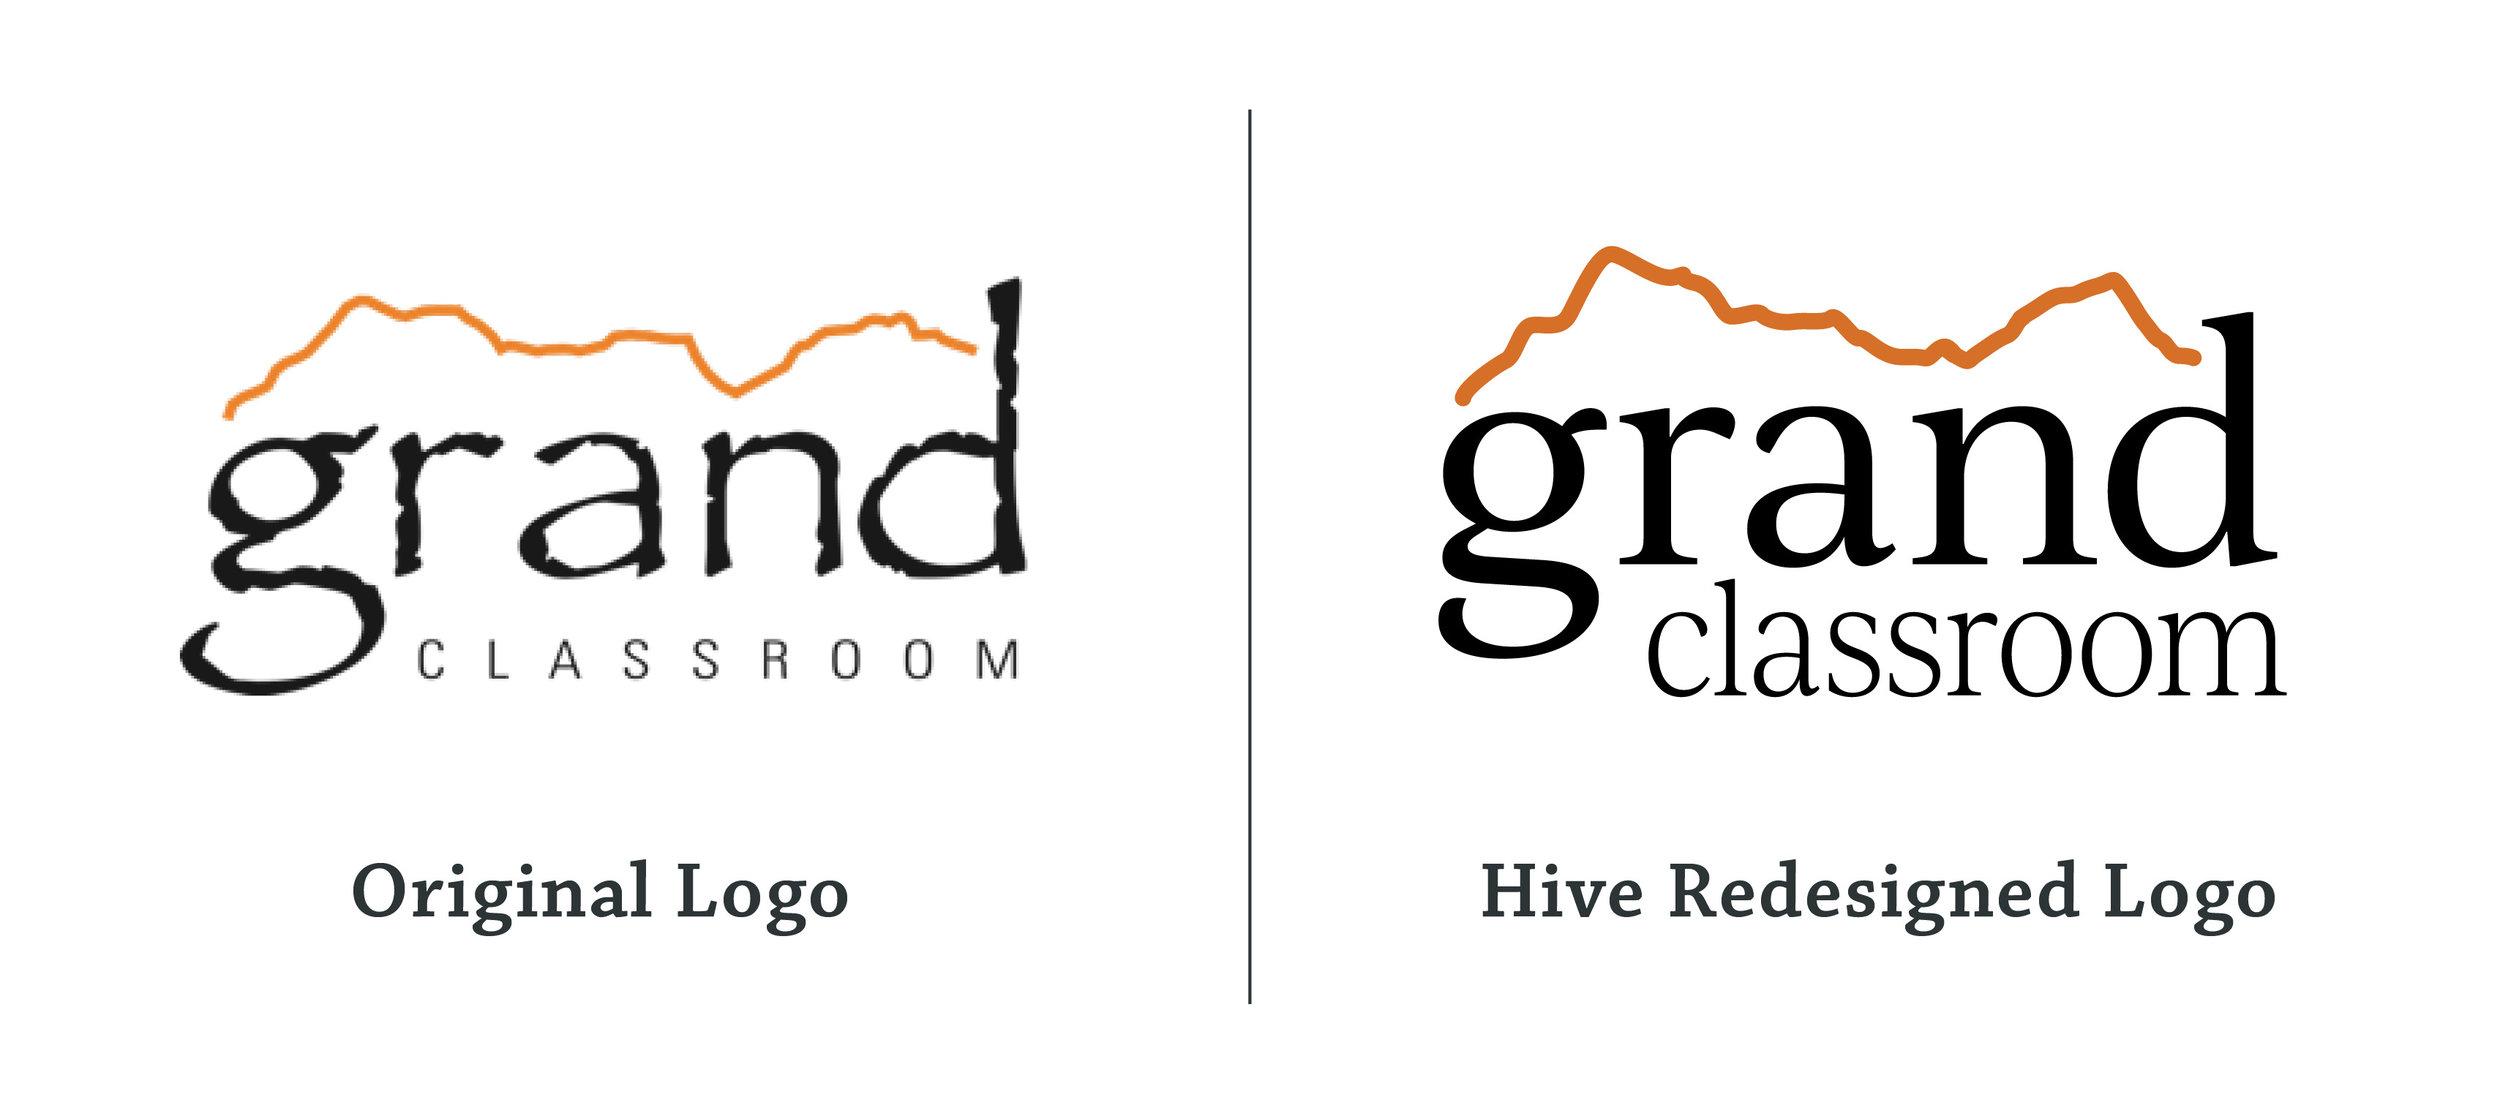 Grand Classroom Logo Redesign example.jpg